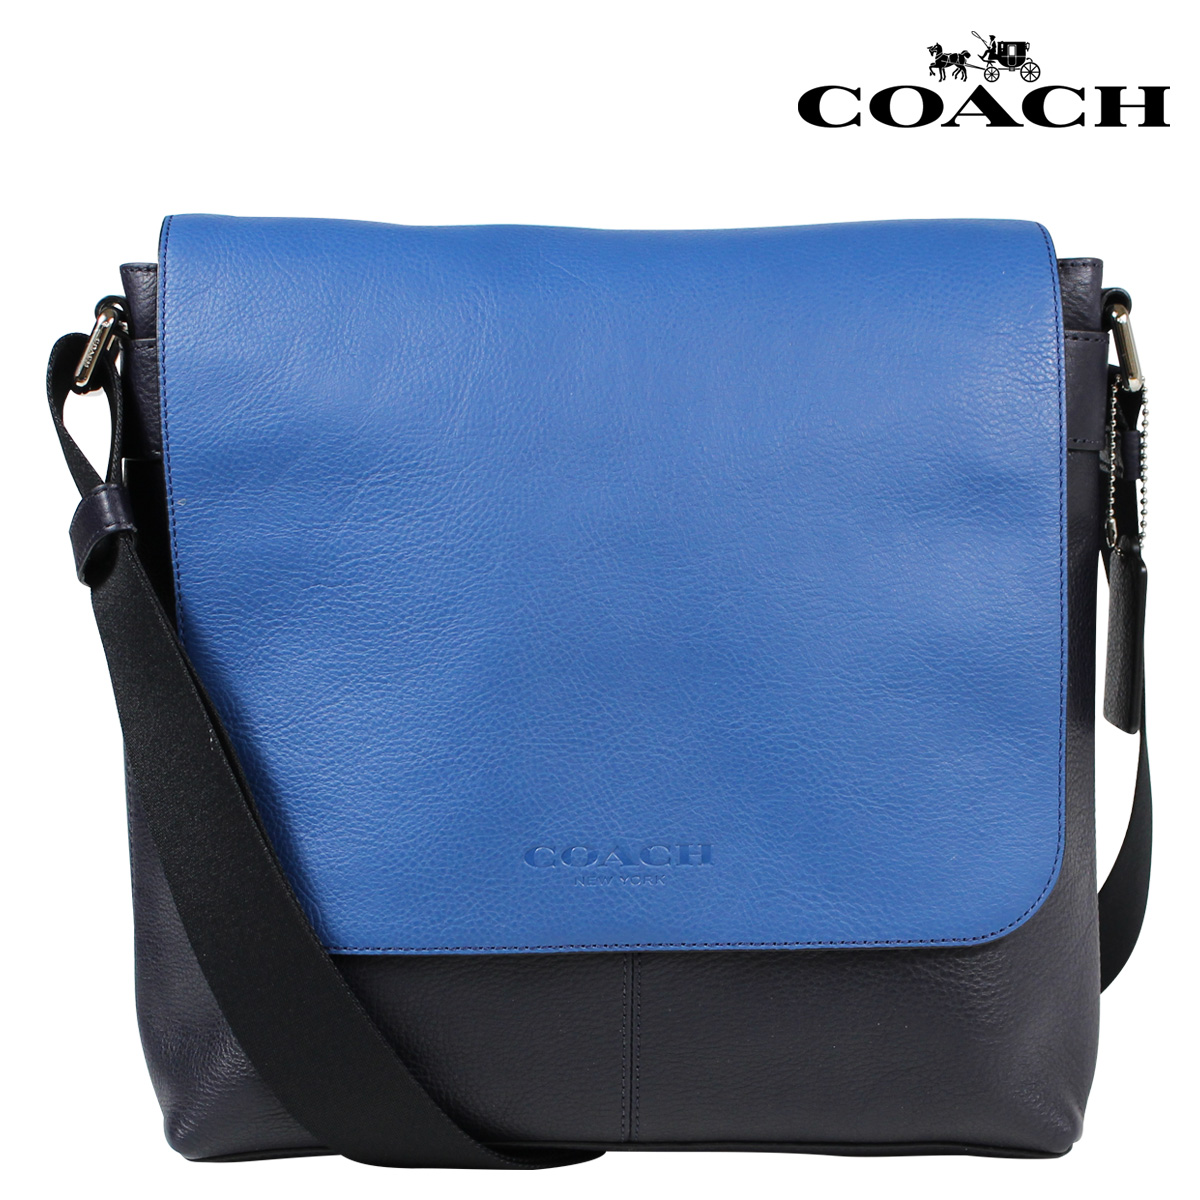 624ba57108de ... leather F56875 FD7 black X dark saddle 3 SOLD OUTCOACH coach men bag  shoulder bag messenger bag F72108 midnight X denim ...